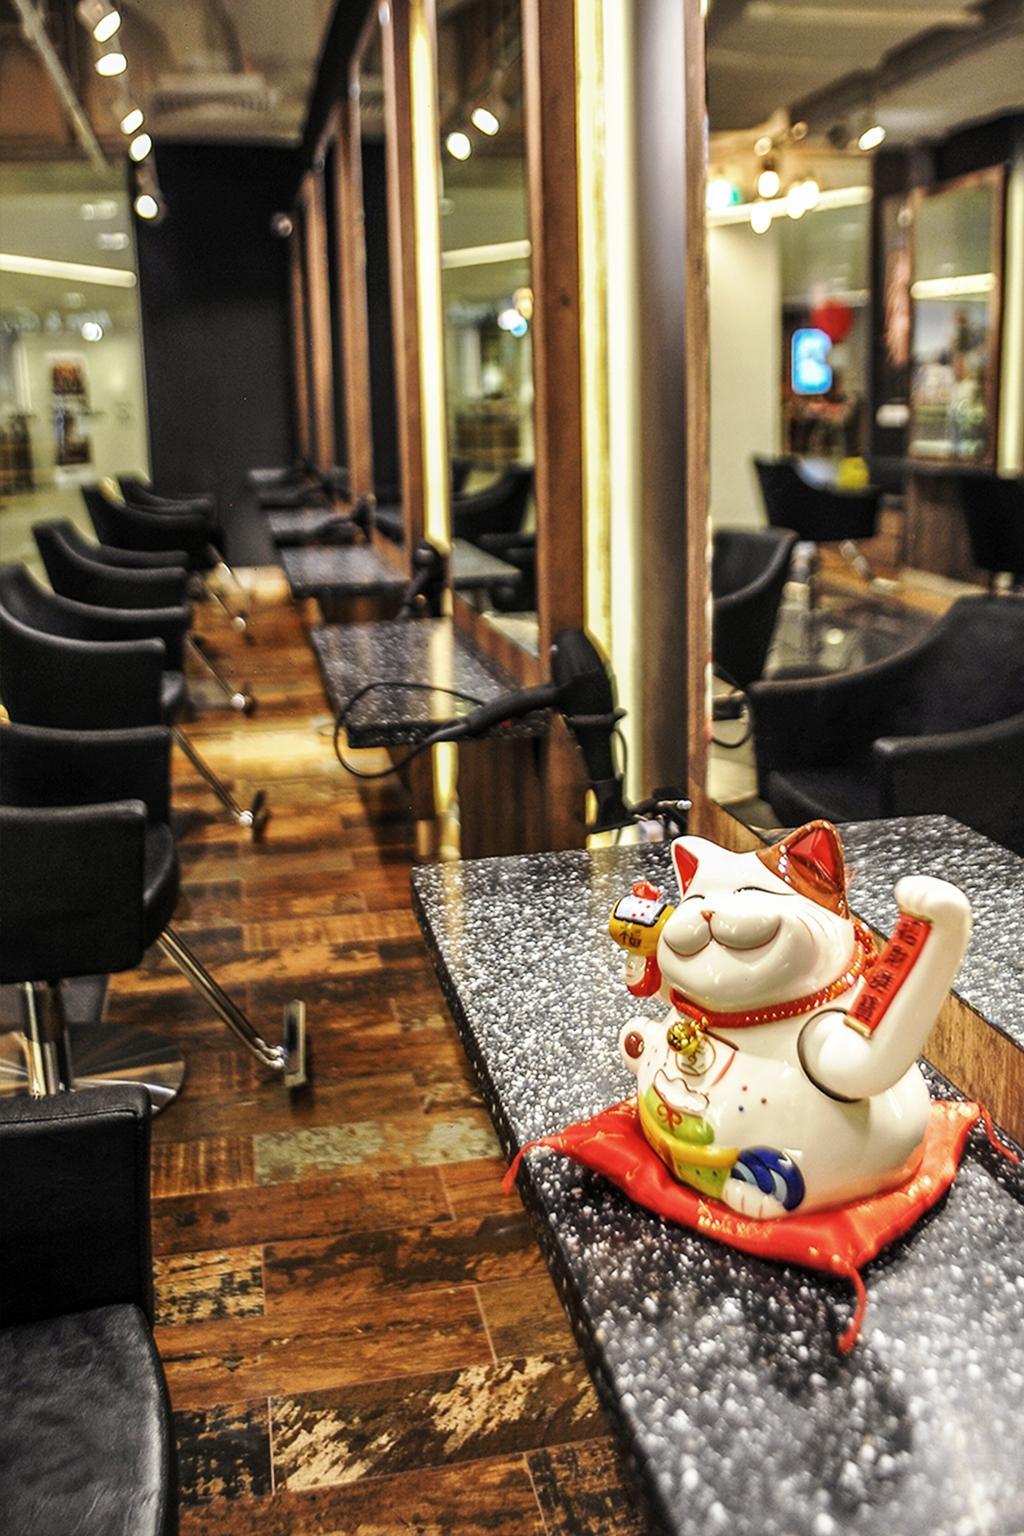 Sun Plaza Alan & Guys, Commercial, Interior Designer, NIJ Design Concept, Modern, Cafe, Restaurant, Chair, Furniture